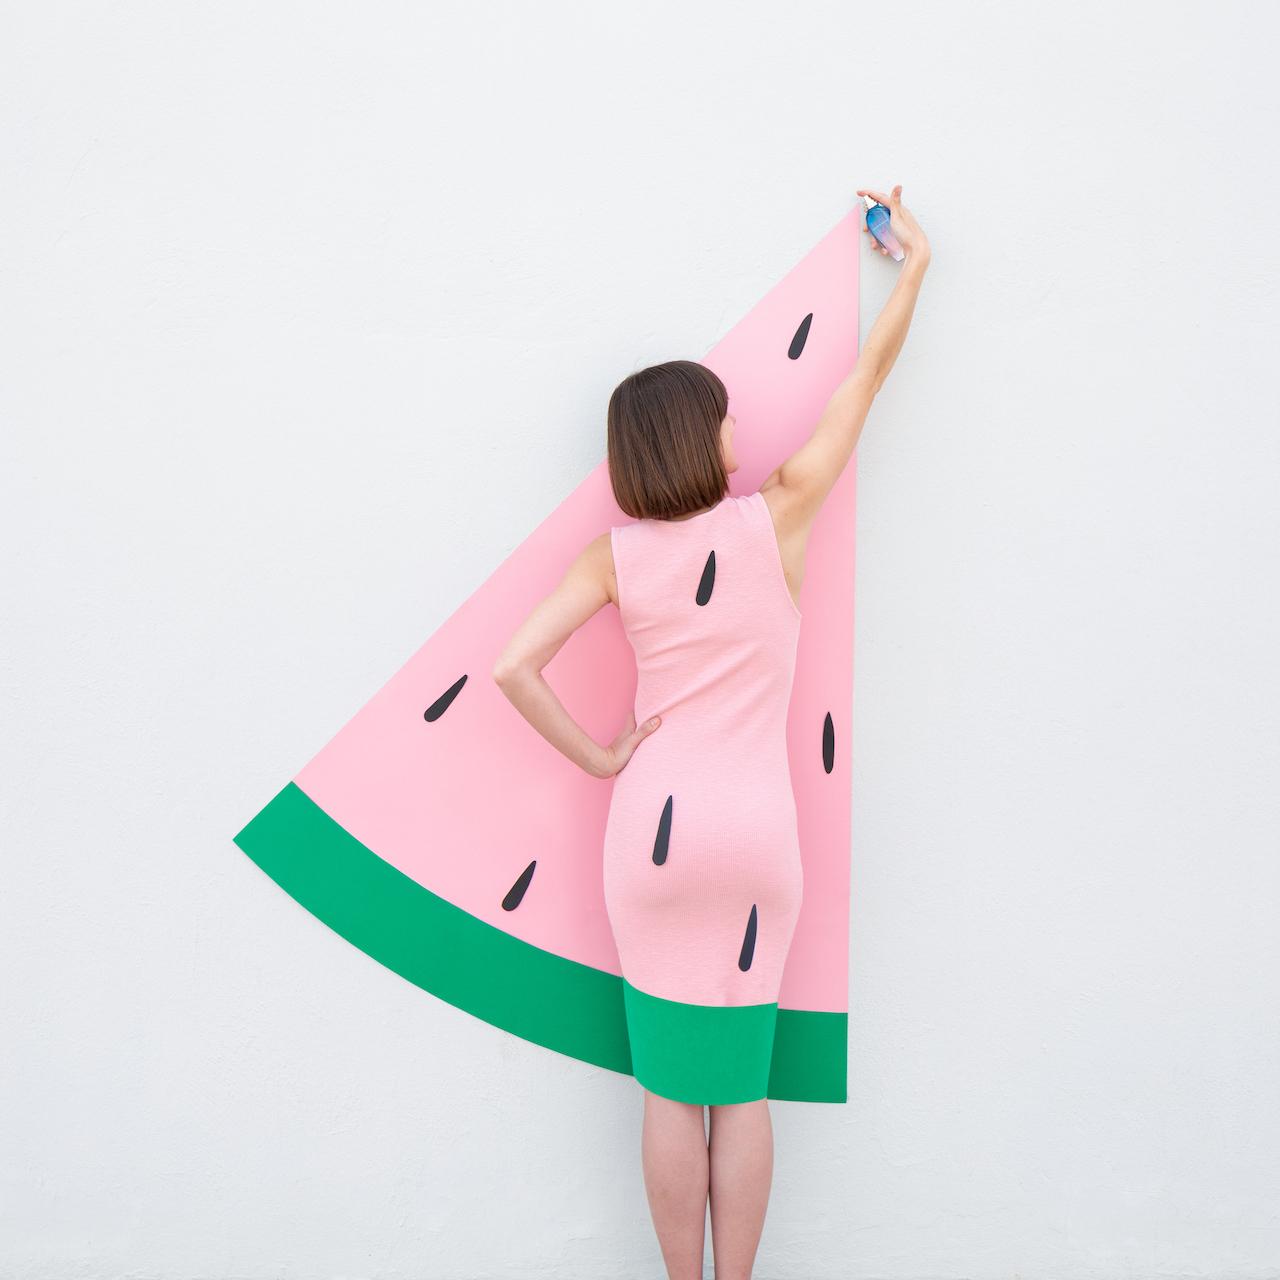 Annandaniel Anniset DrCuerda Anna Devís Daniel Rueda Papertastic One in a Melon Instagram creative influencer campaign Escada Sorbetto Rosso Watermelon